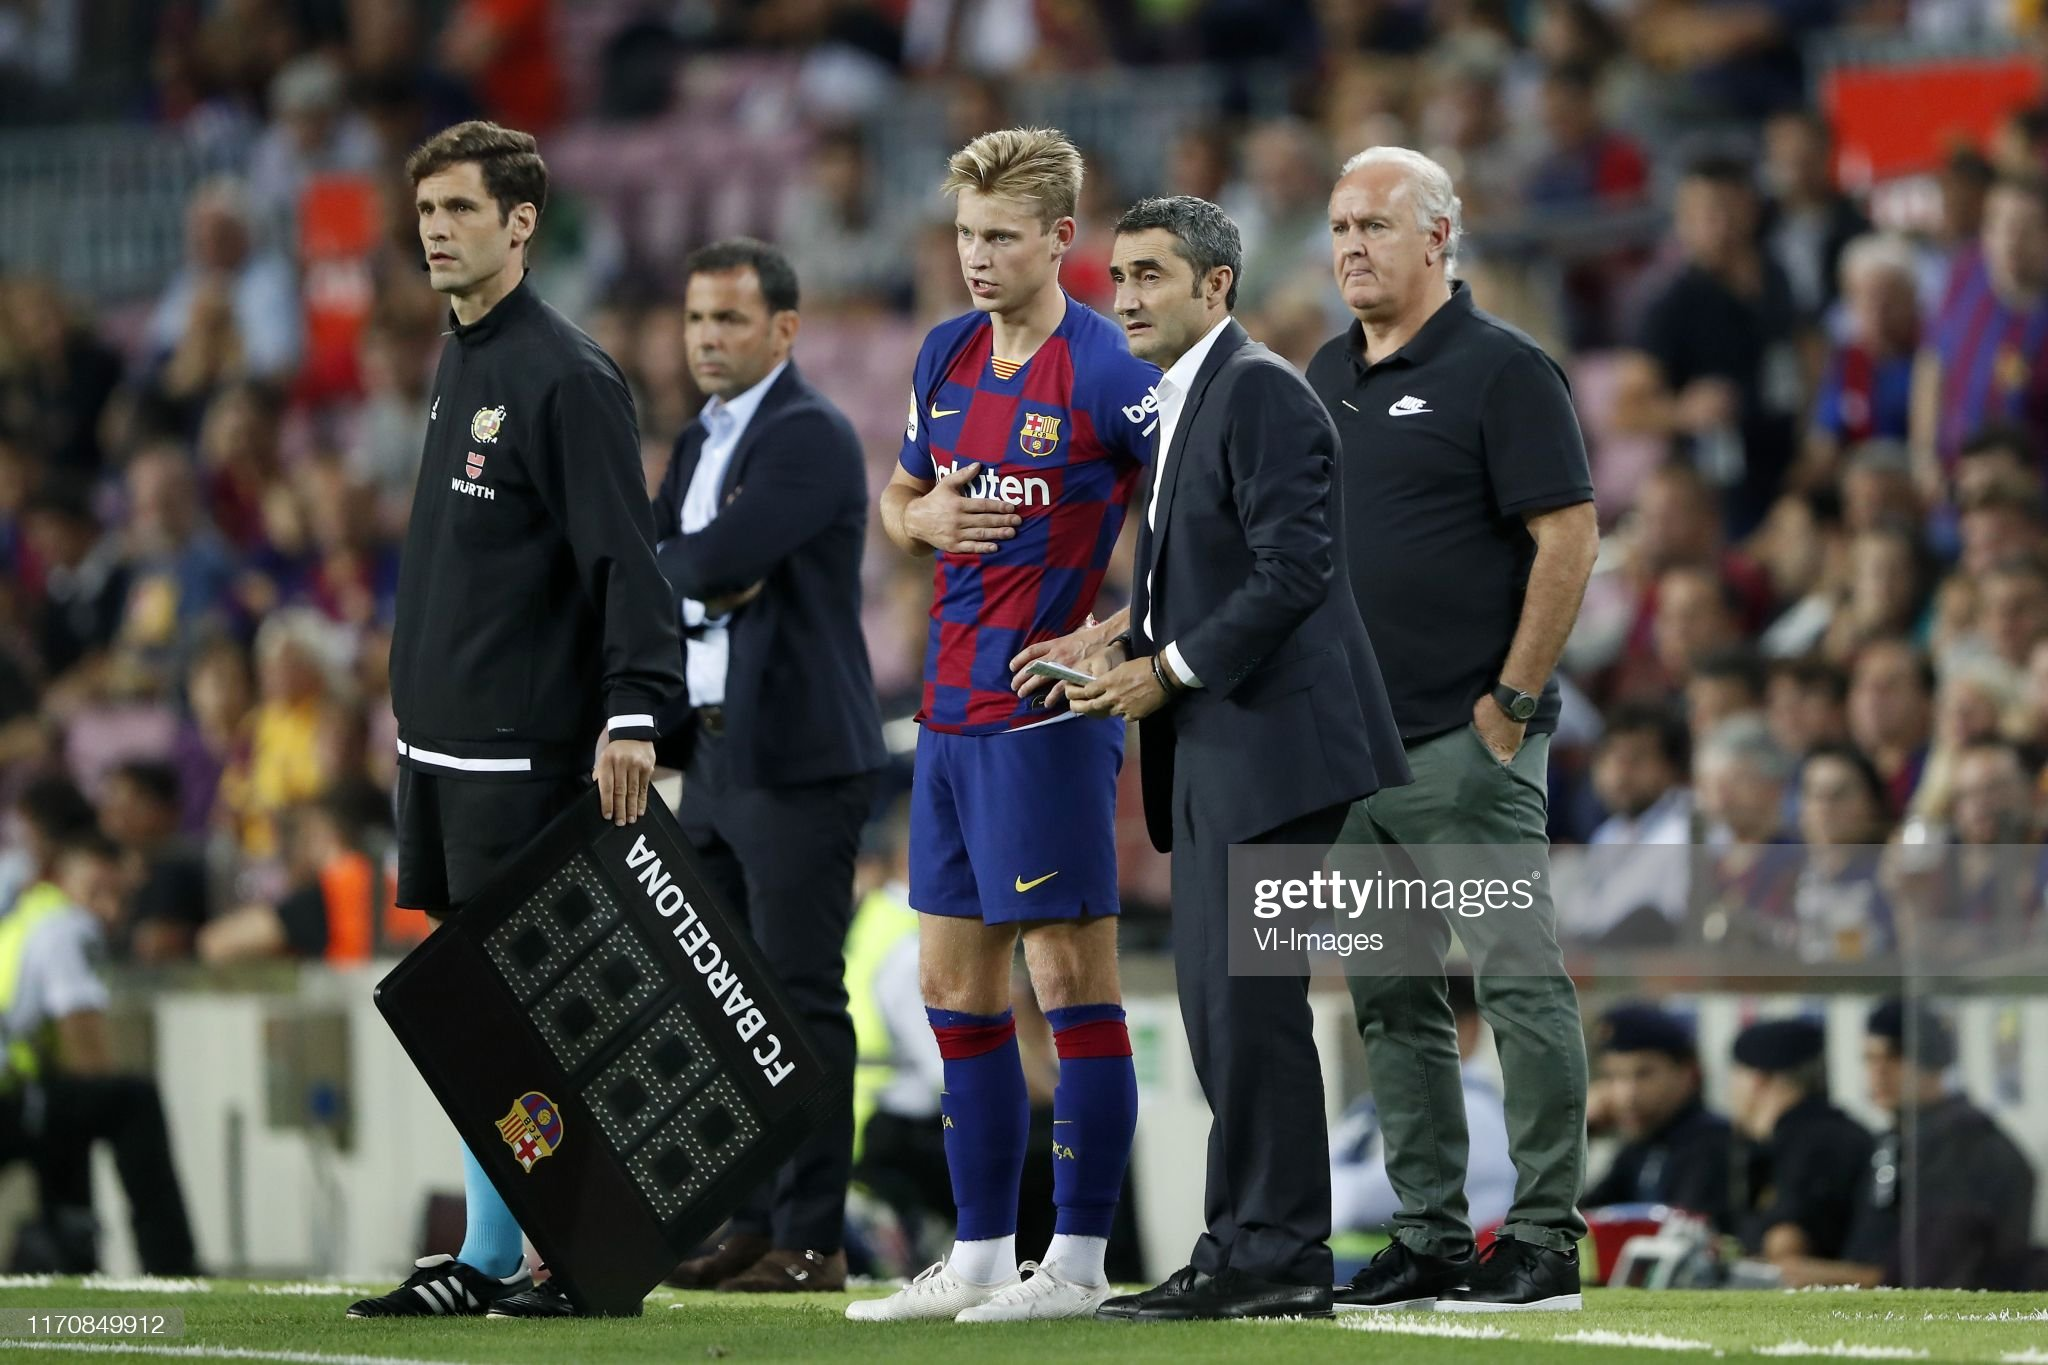 صور مباراة : برشلونة - فياريال 2-1 ( 24-09-2019 )  Frenkie-de-jong-of-fc-barcelona-fc-barcelona-coach-ernesto-valverde-picture-id1170849912?s=2048x2048